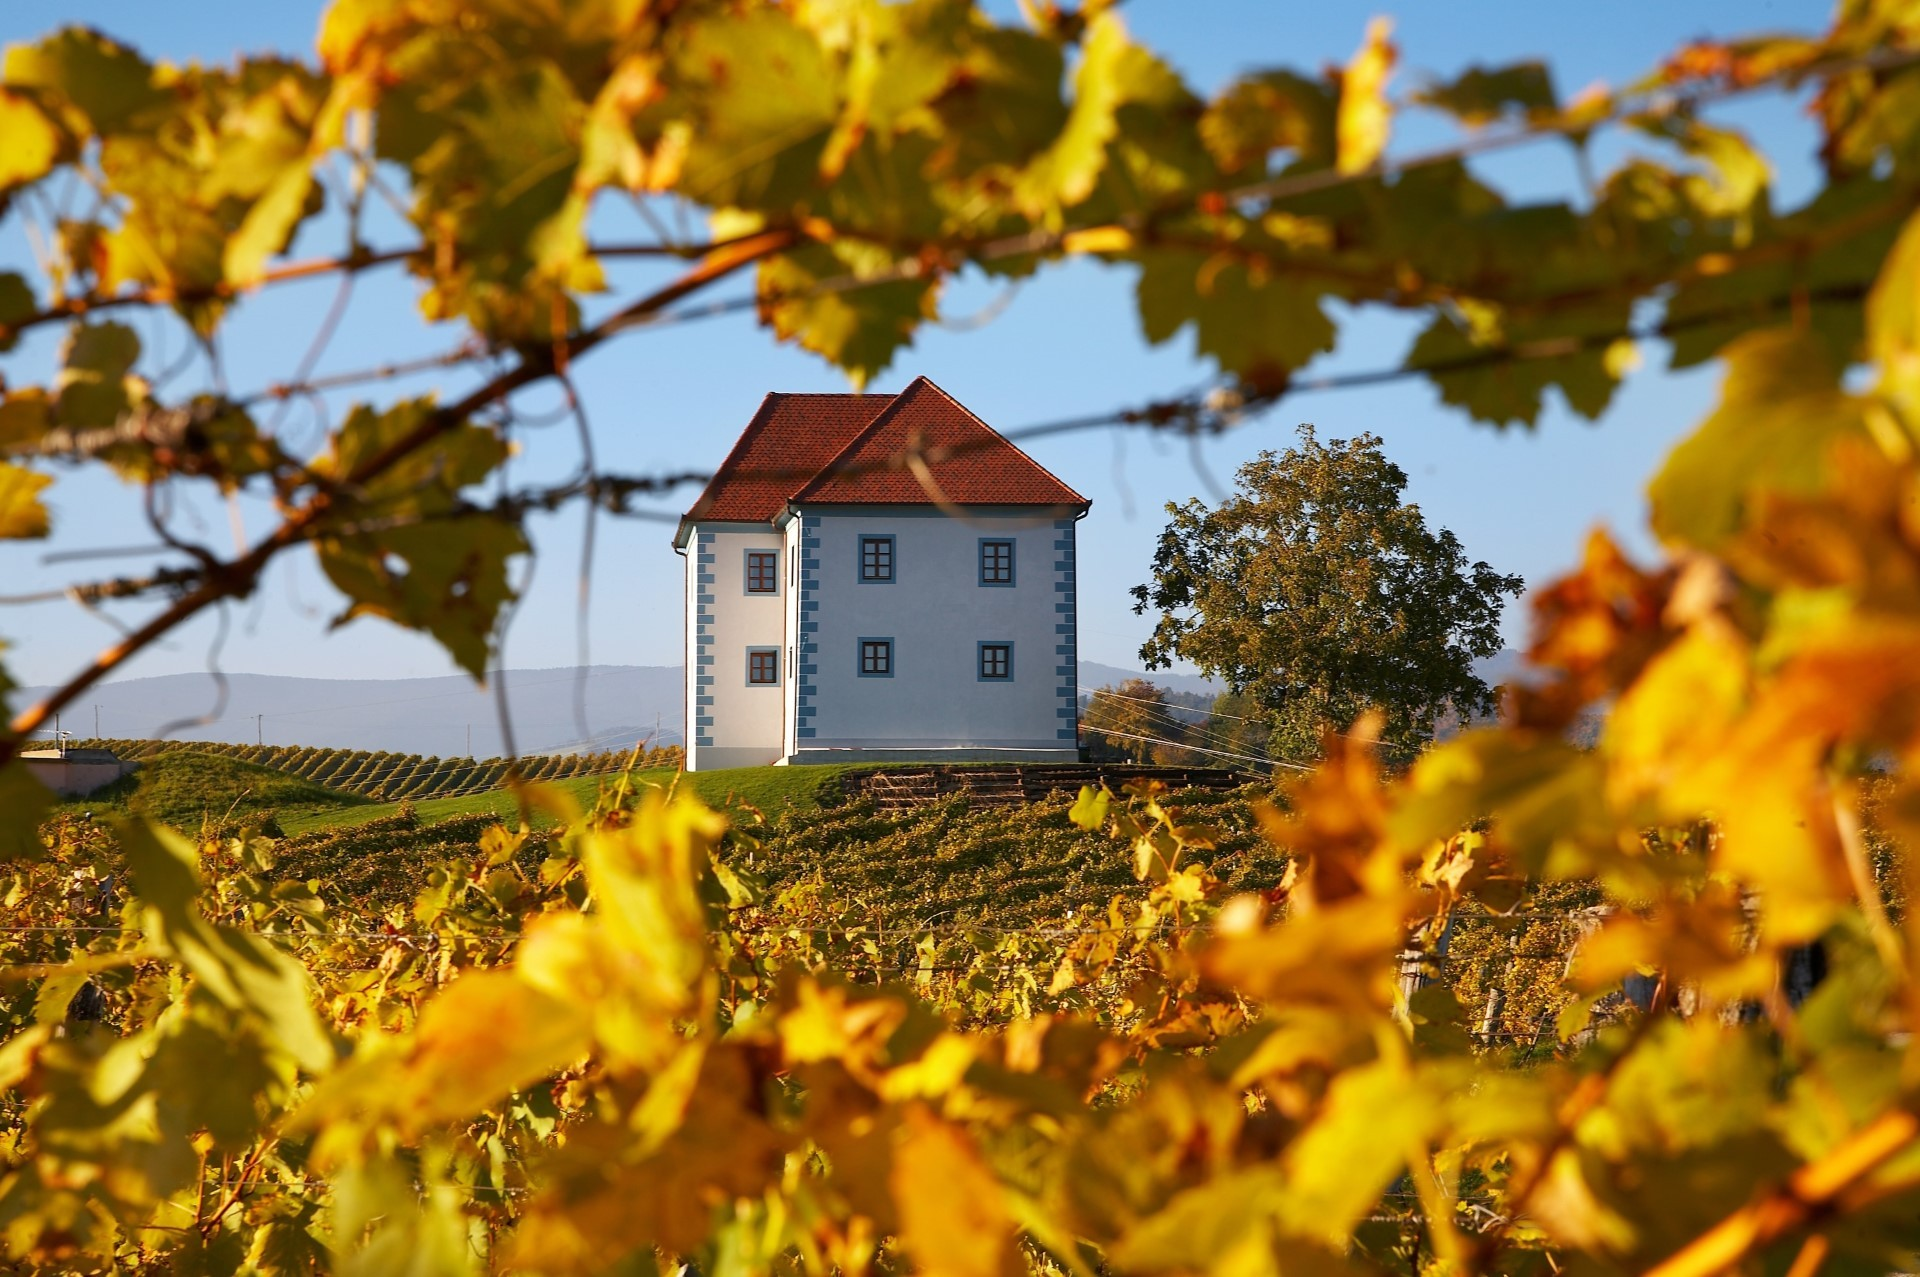 Vinogradniški dvorec med vinogradom